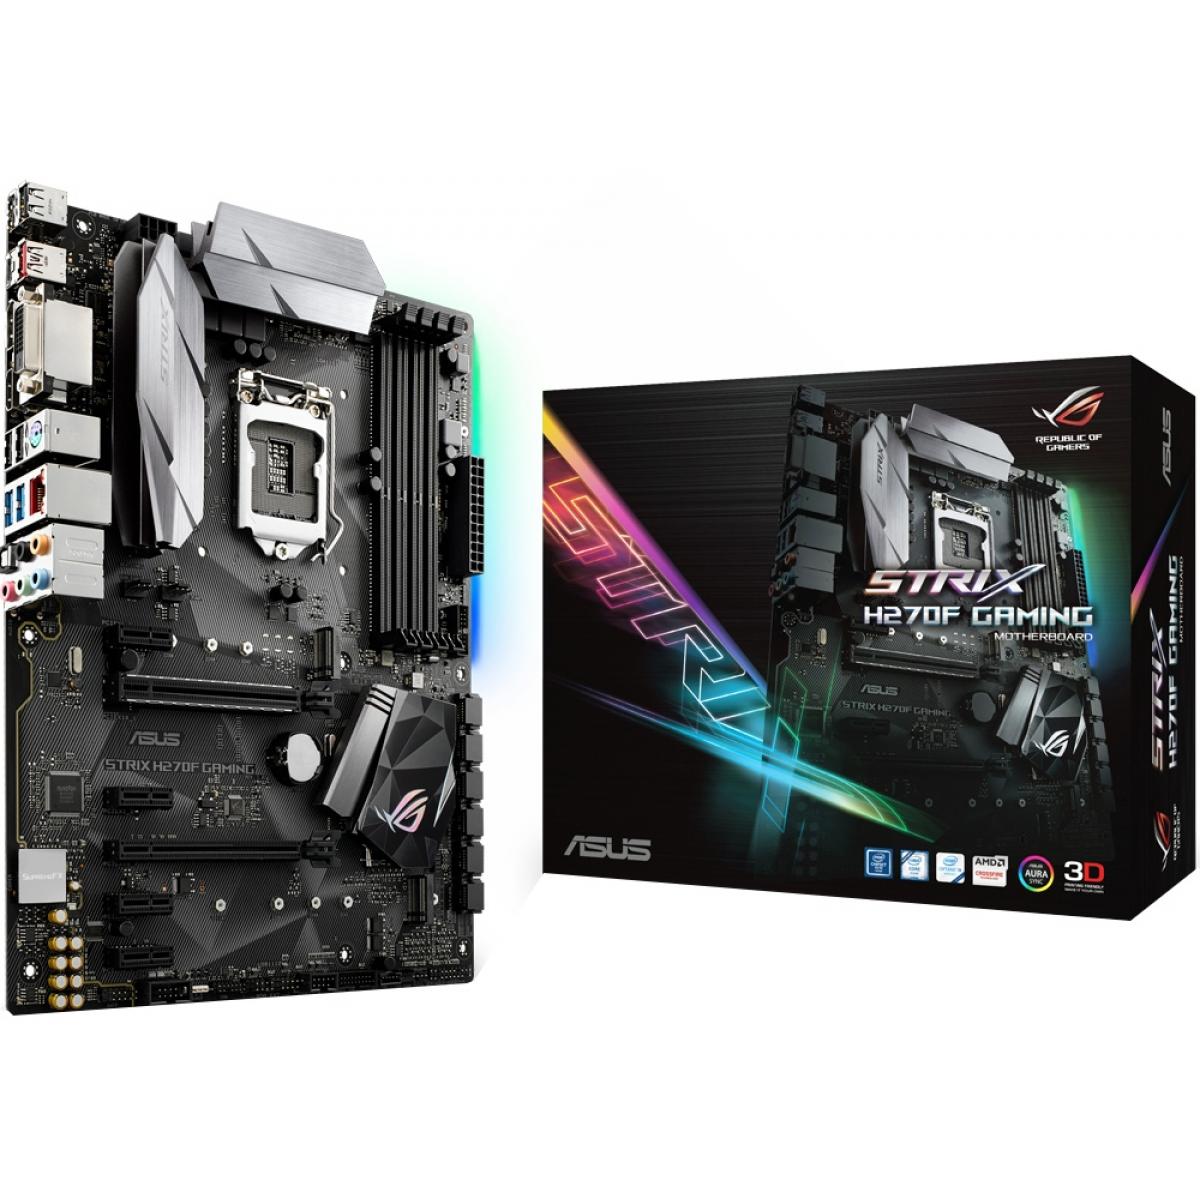 Placa Mãe Asus ROG Strix H270F Gaming, Chipset H270, Intel LGA 1151, ATX, DDR4